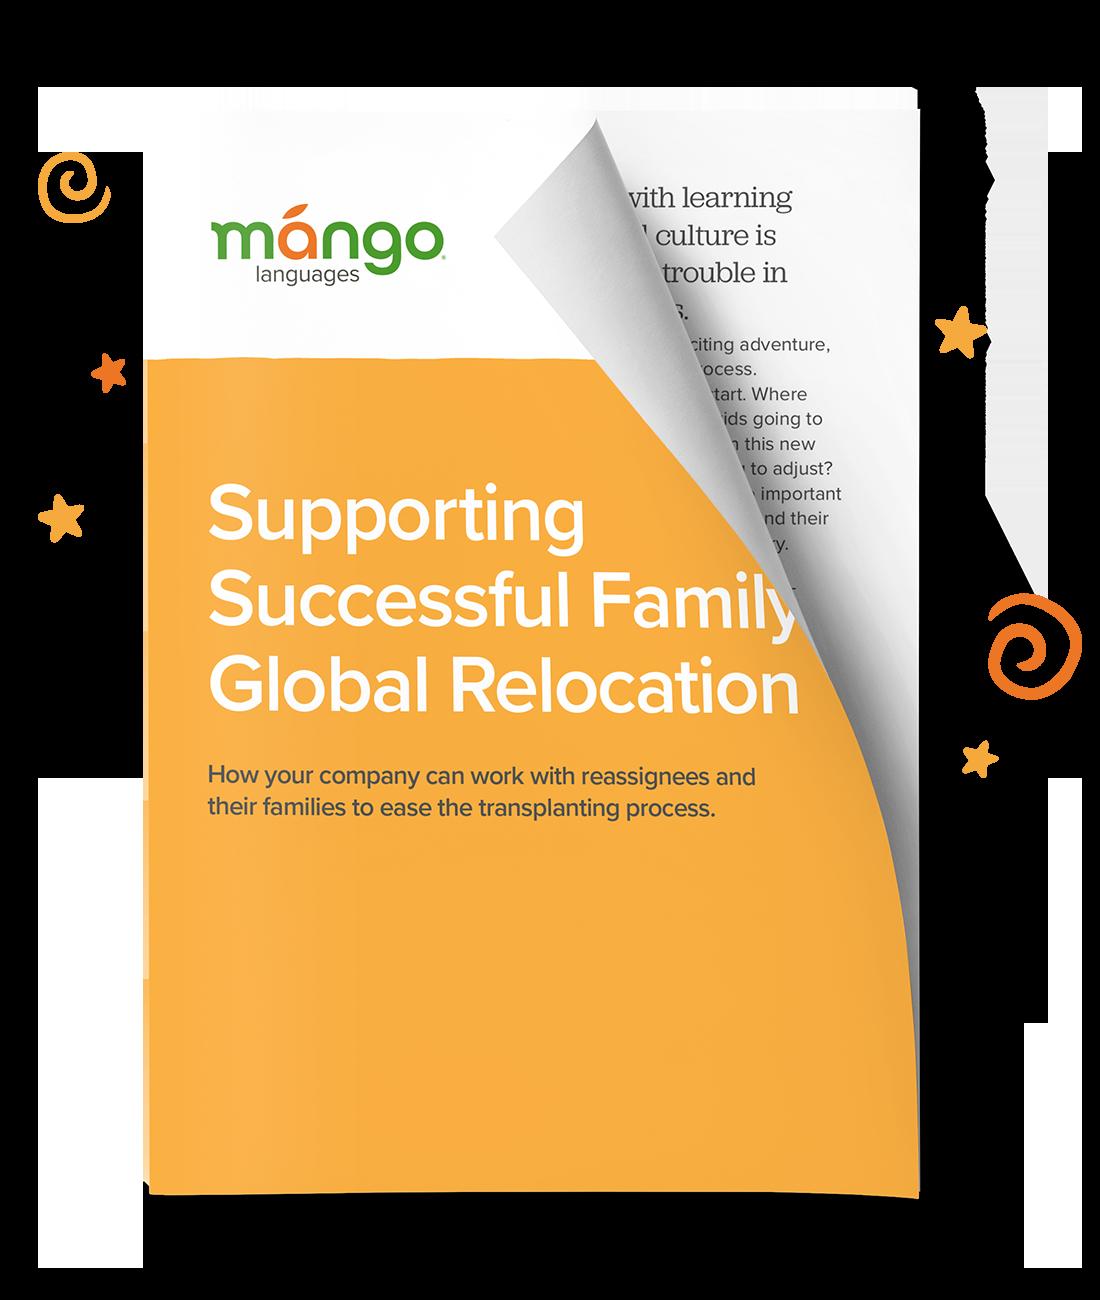 mango-inbound-global-relocation